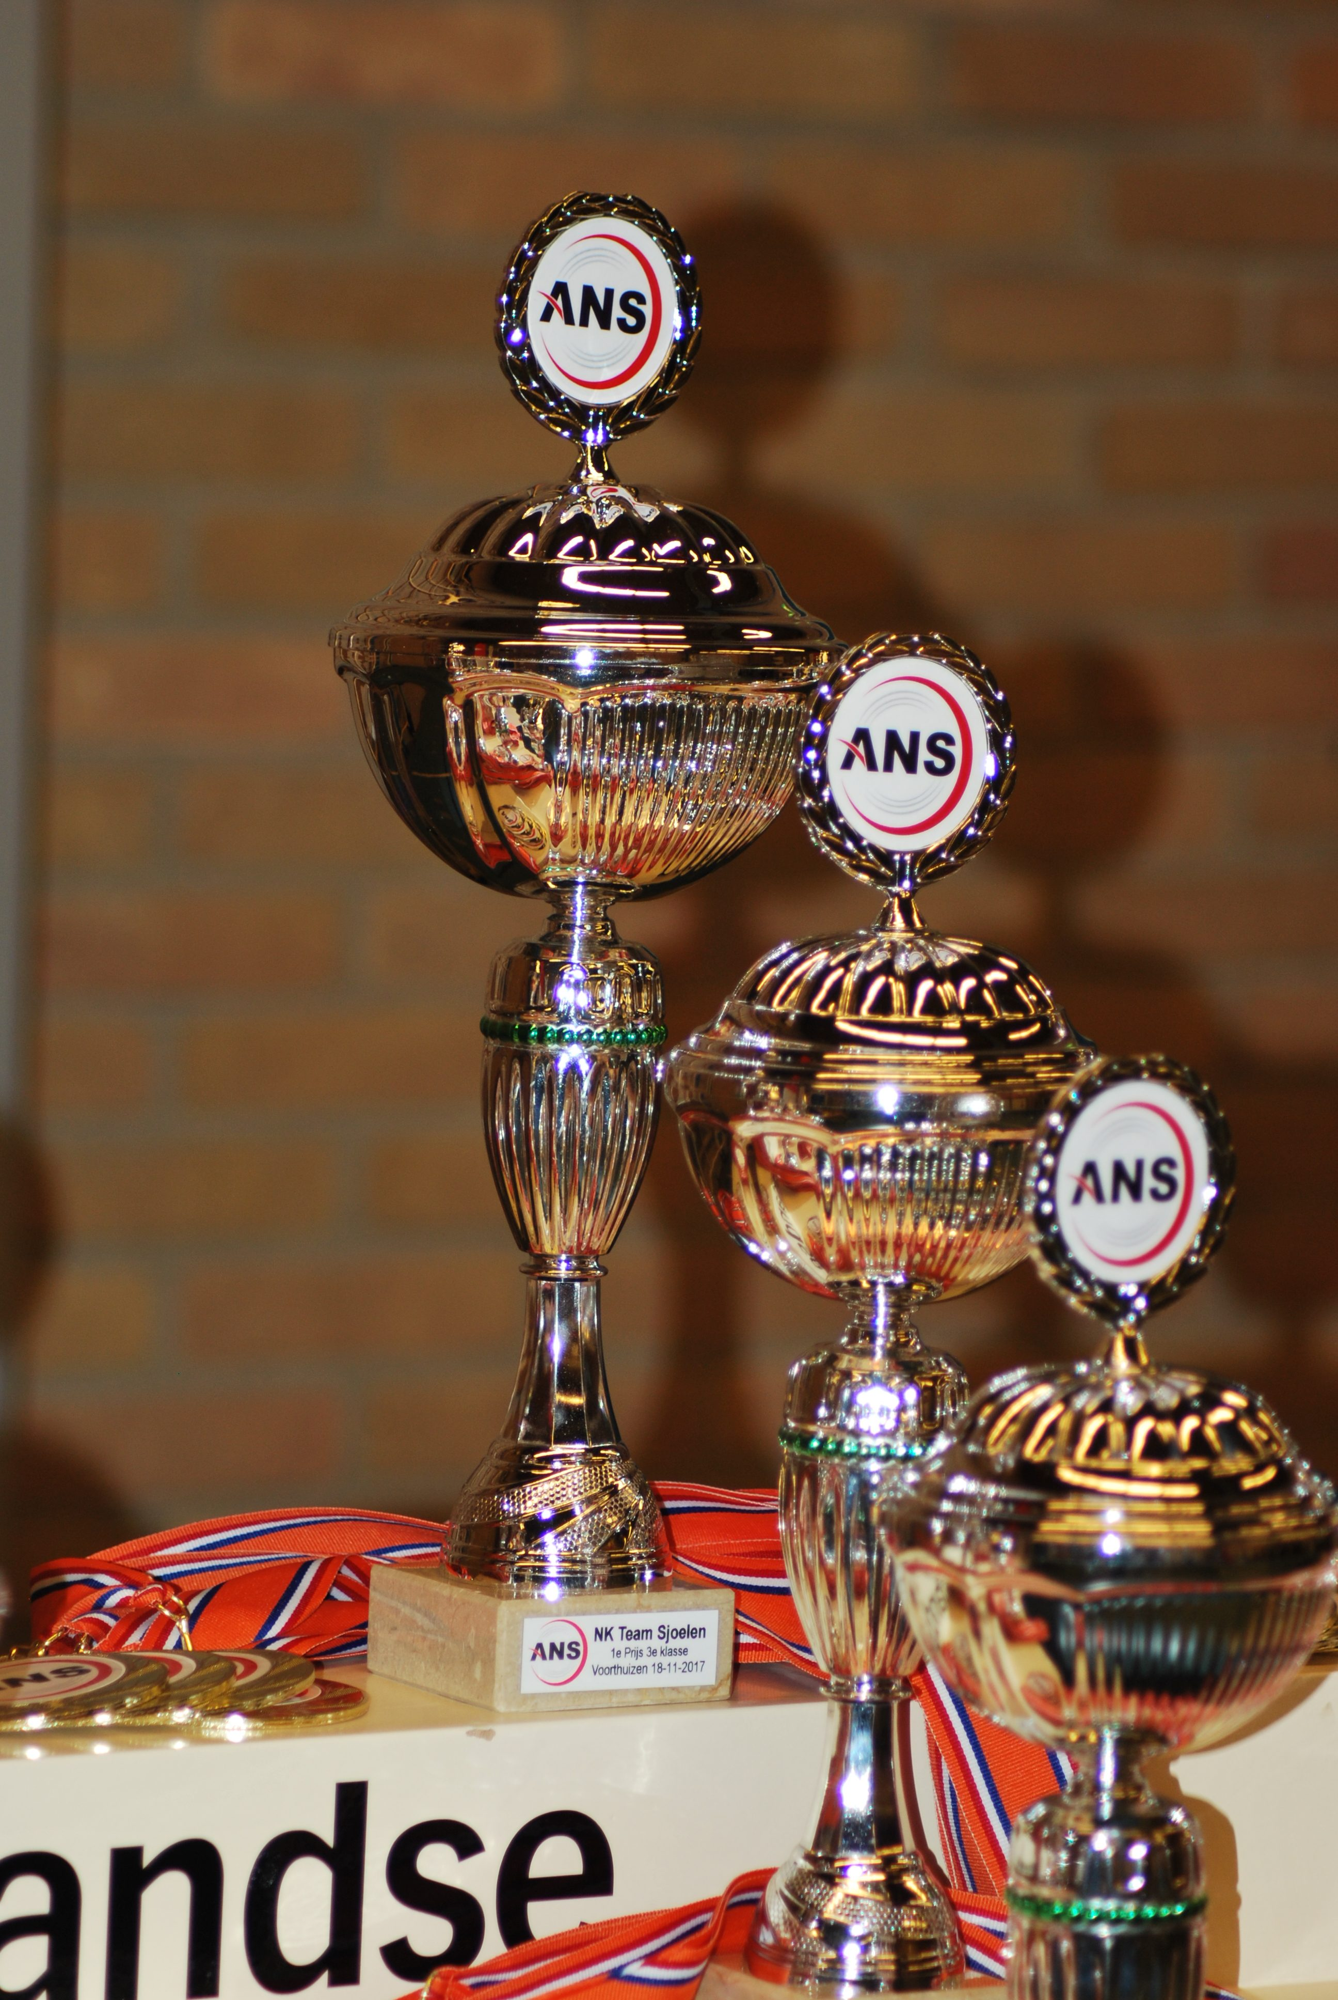 NK-teamsjoelen-18-11-2017 (9)